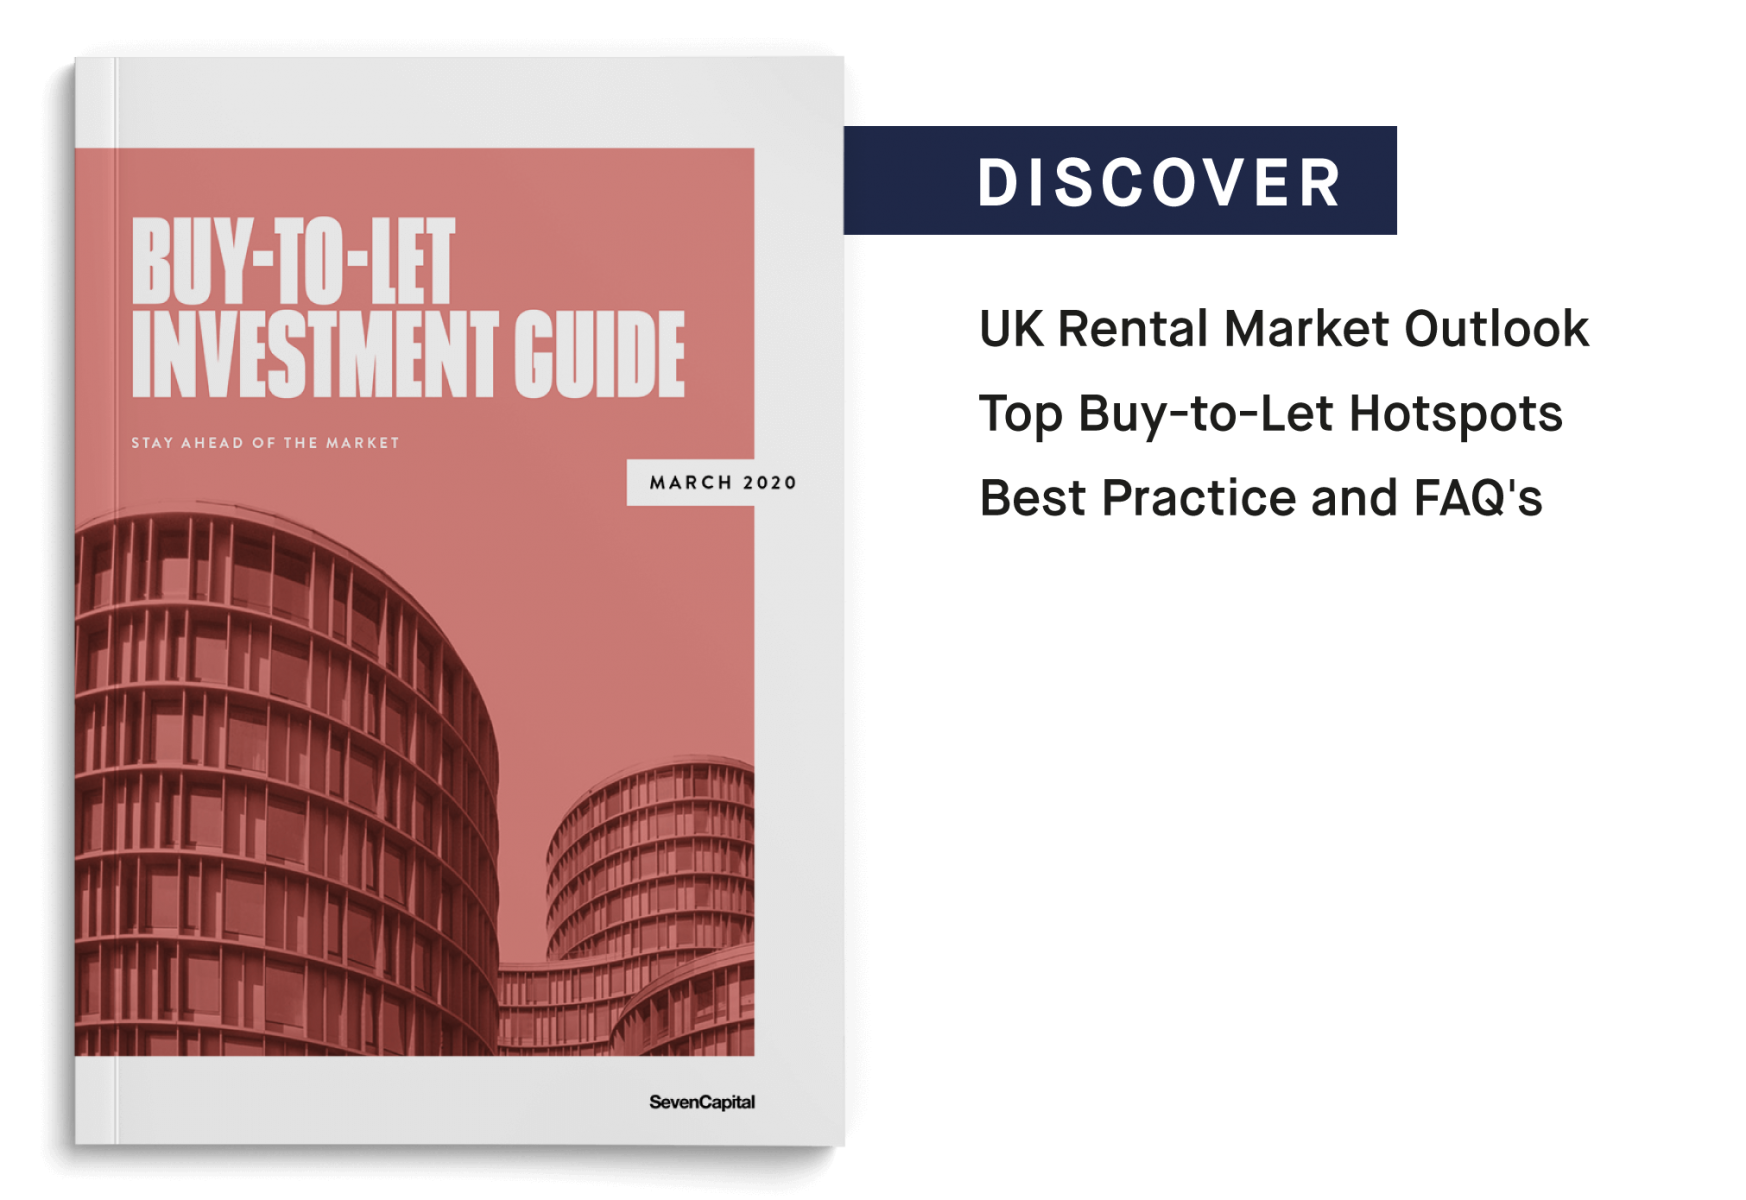 BTL-Guide-Thumbnail-Discovery